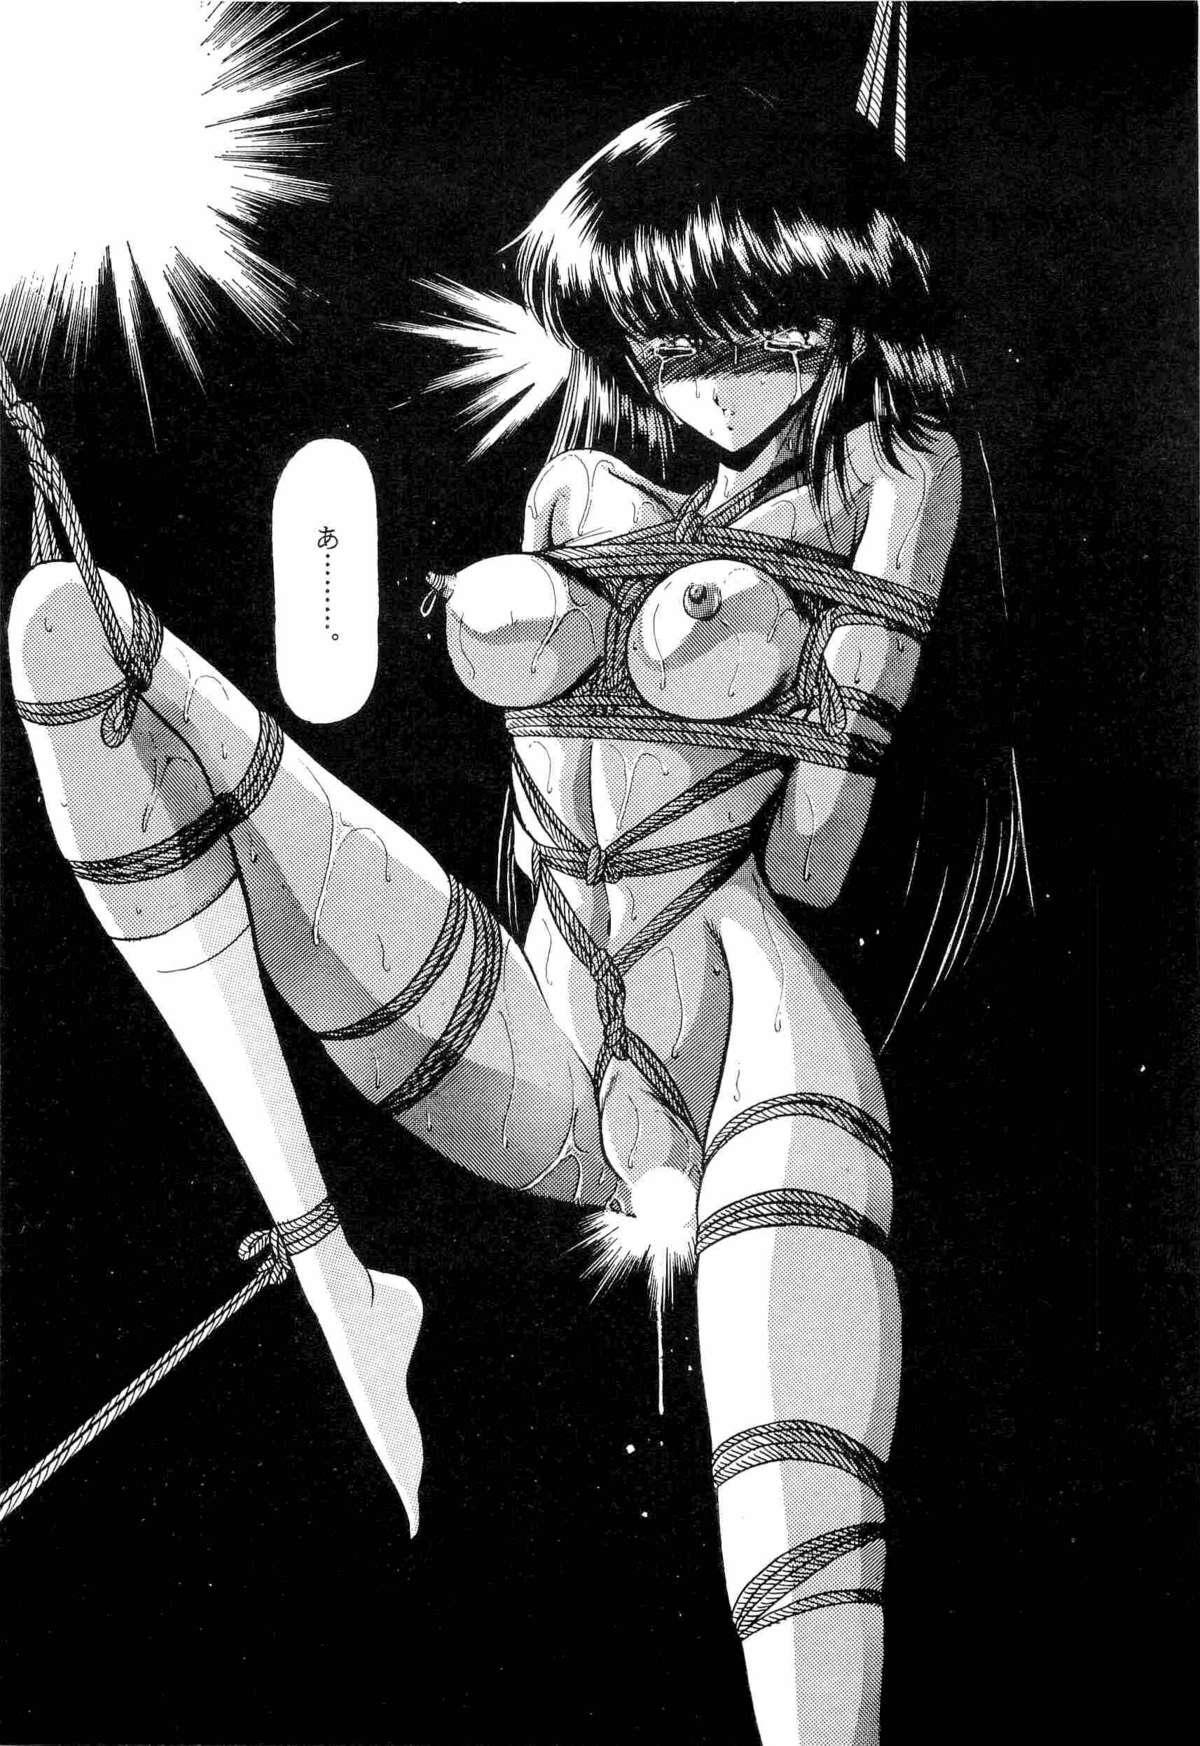 Bisyoujo Anthology '93 jyoukan 53